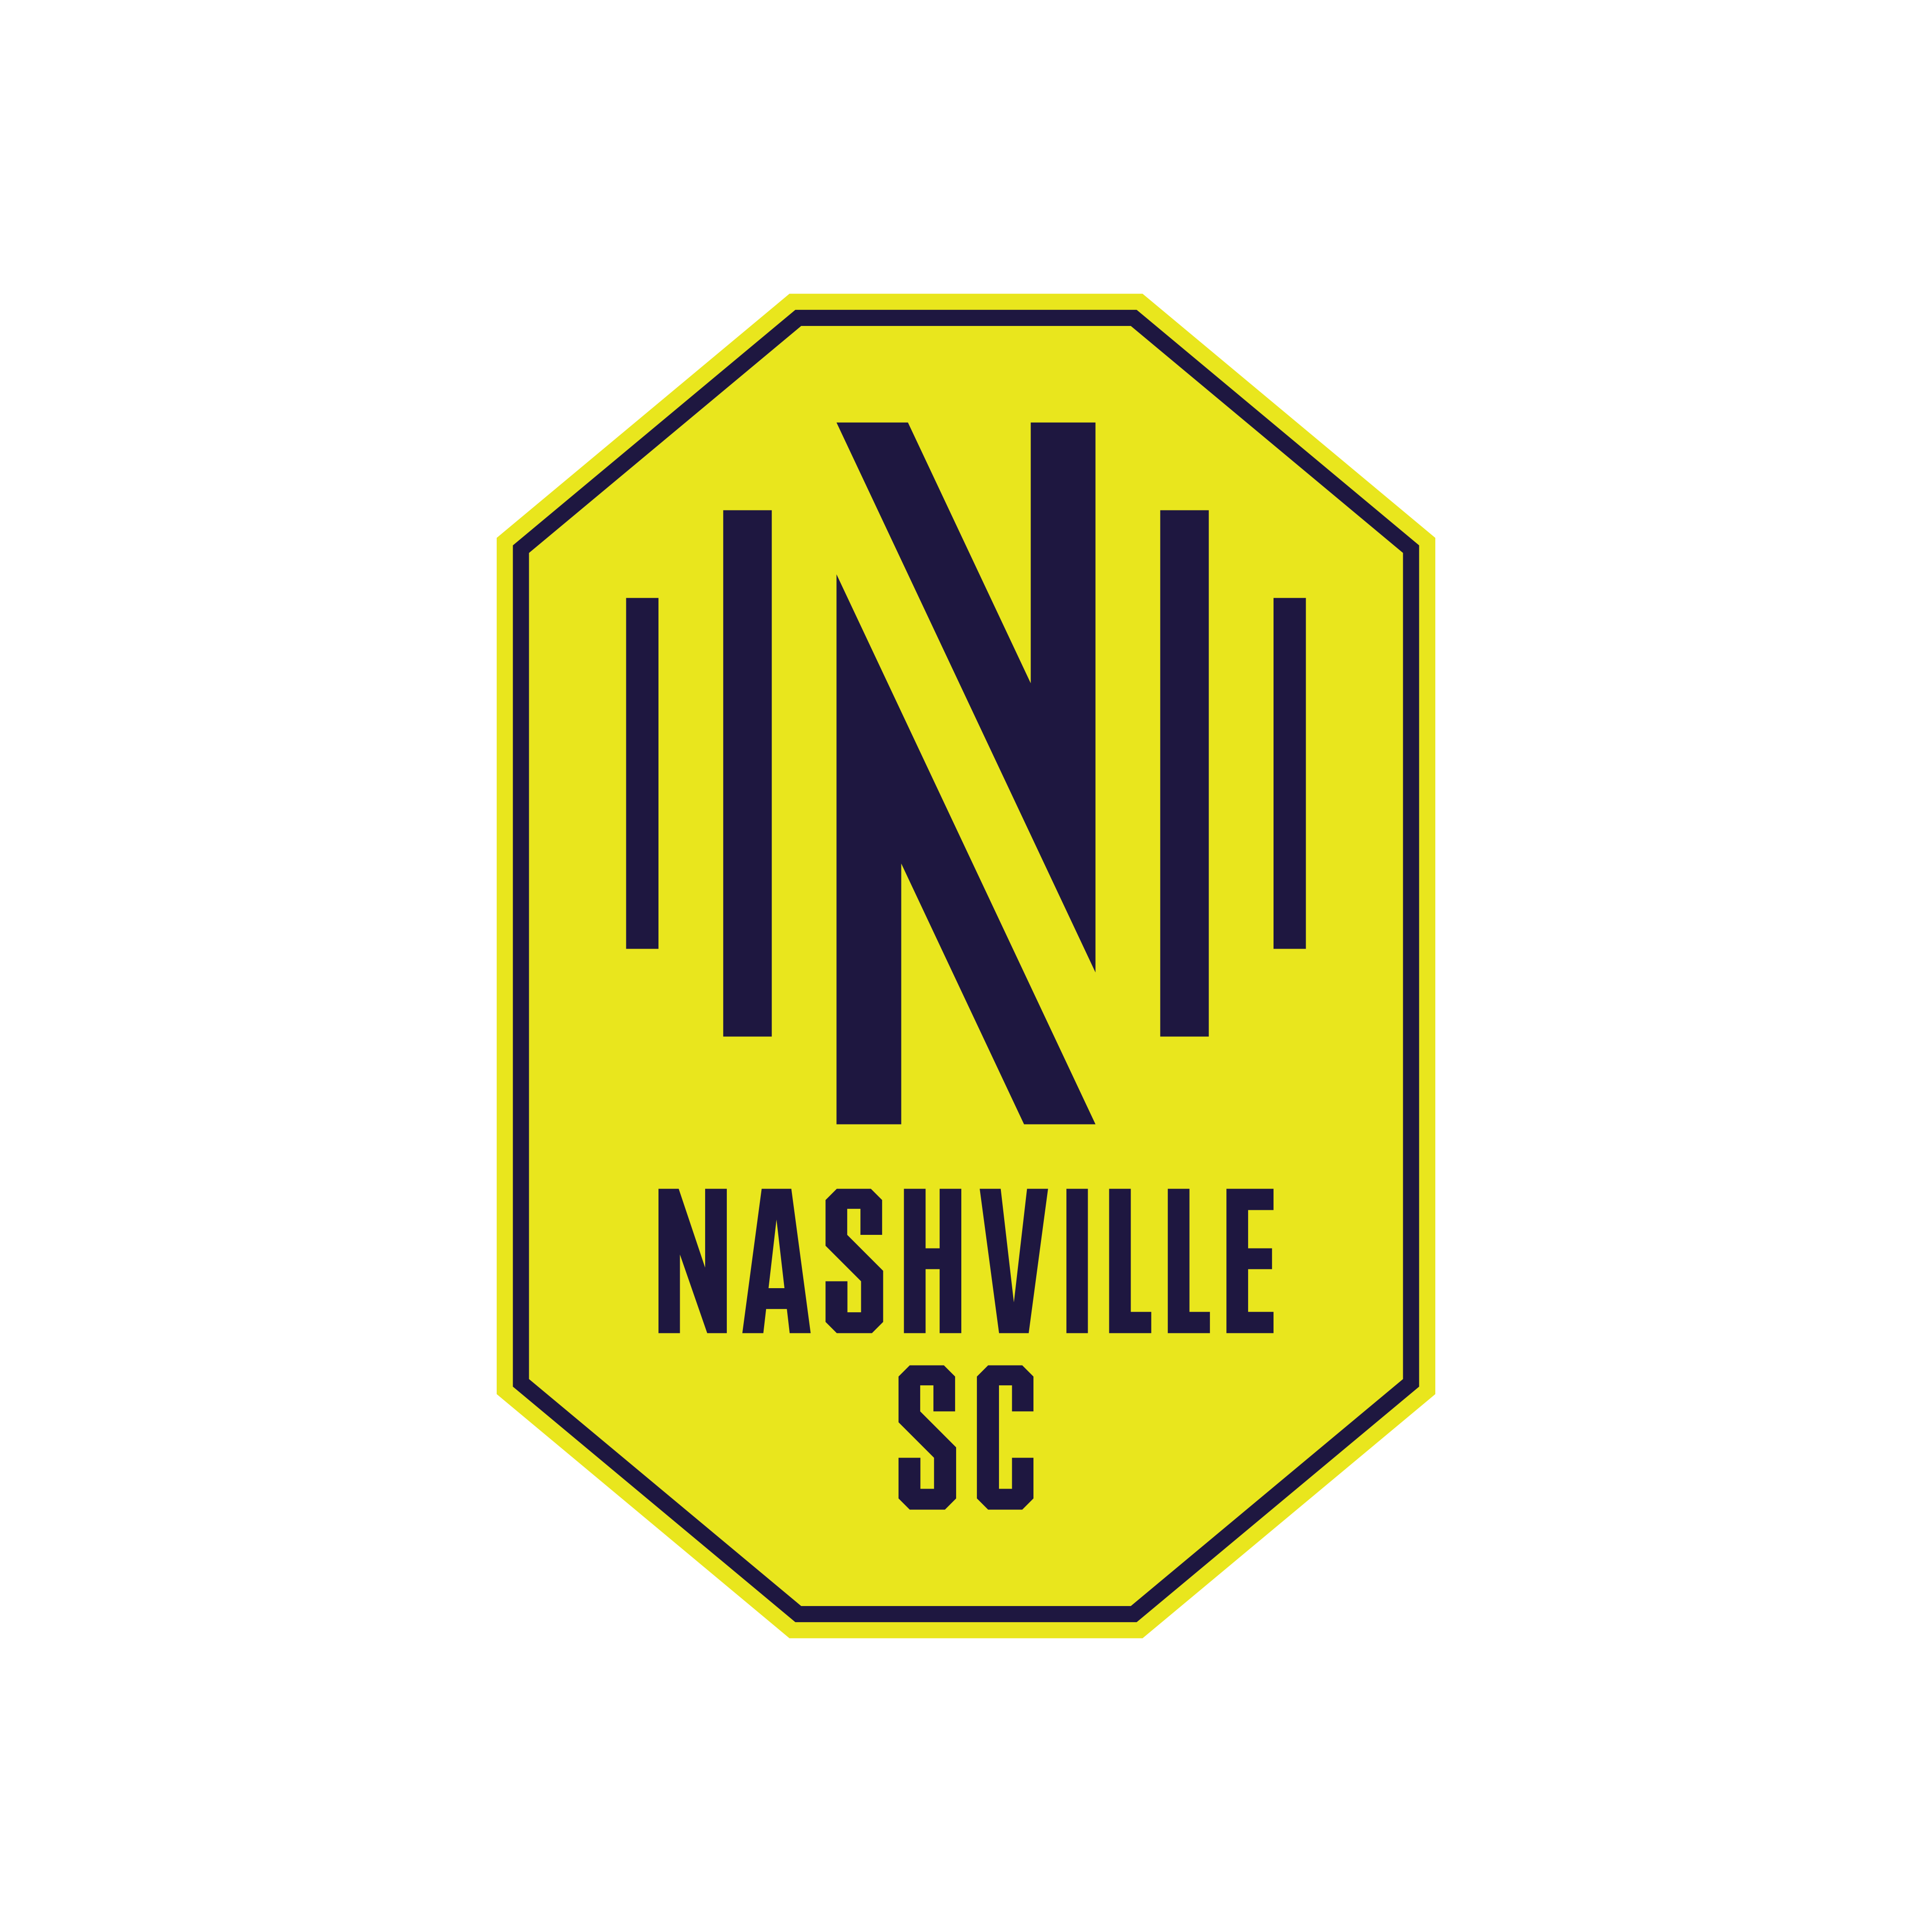 nashville soccer club logo 0 - Nashville Soccer Club logo